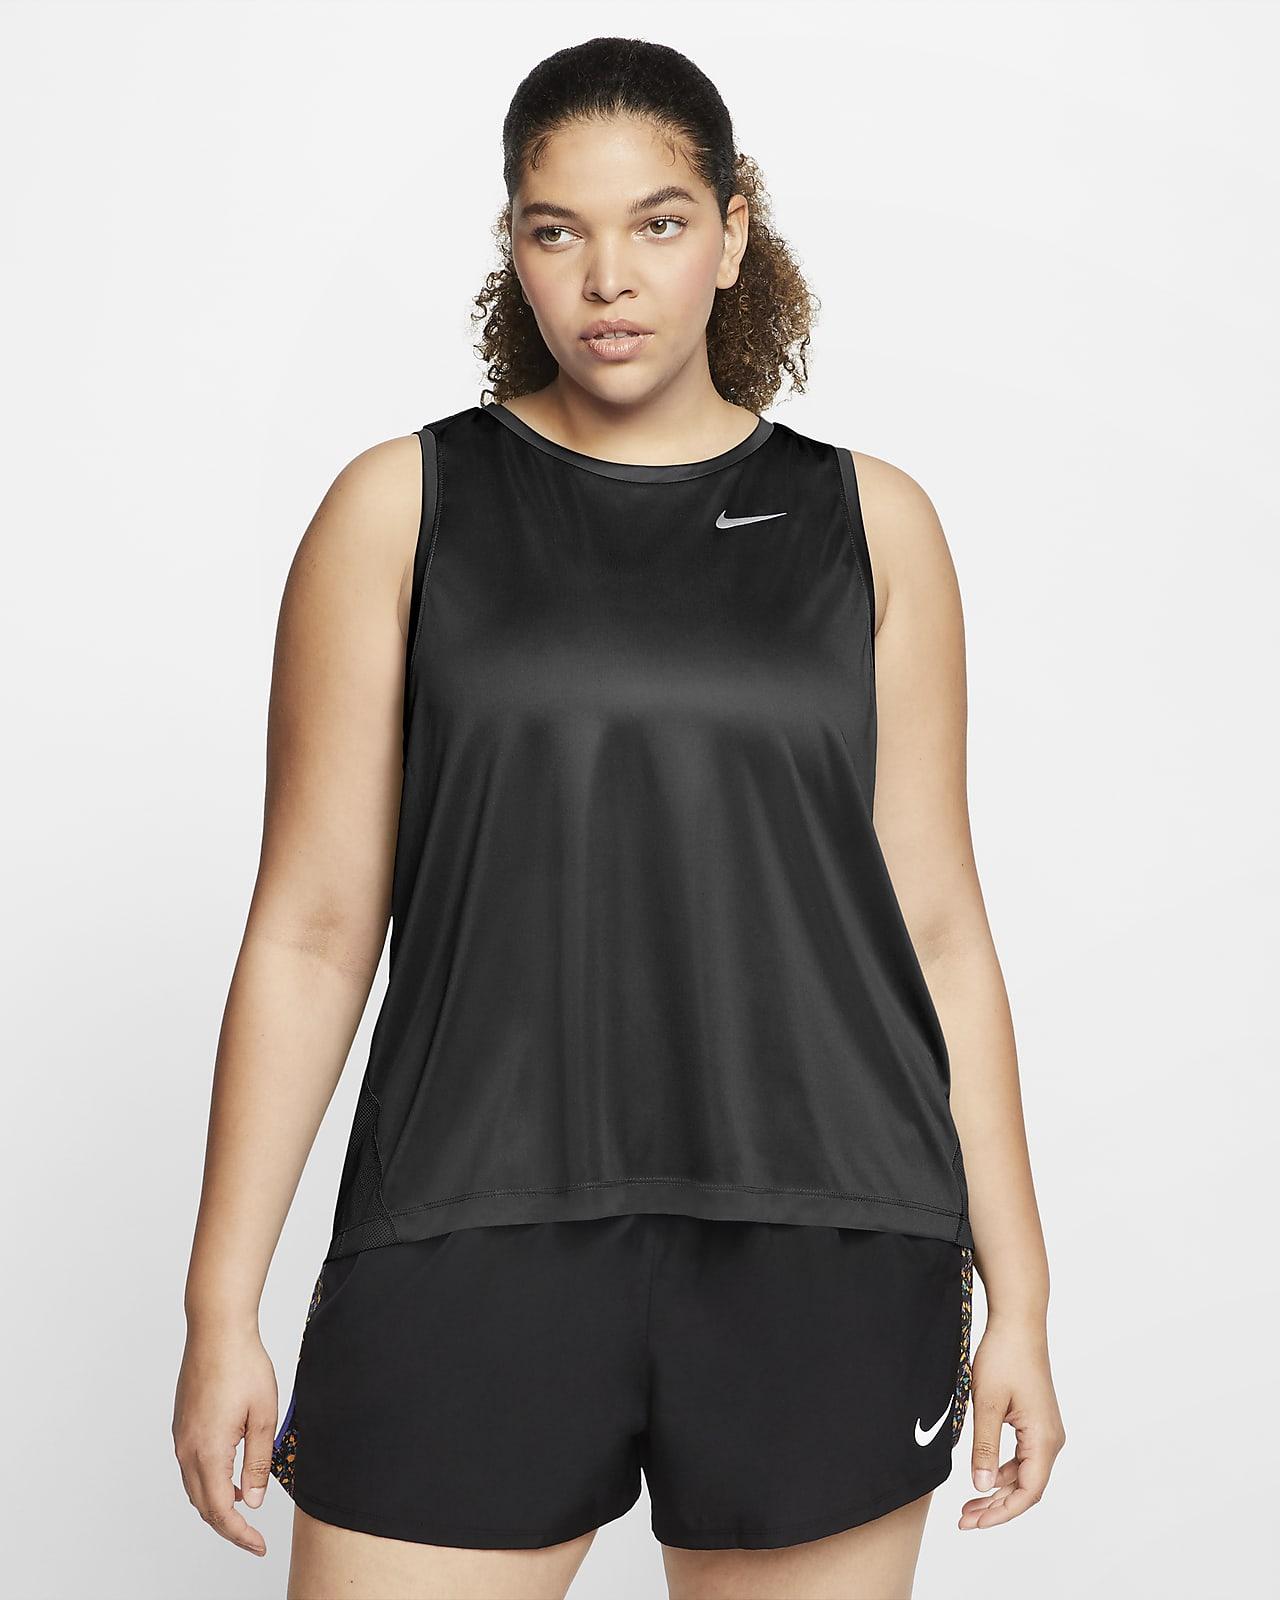 Nike Miler Hardlooptanktop voor dames (grote maten)